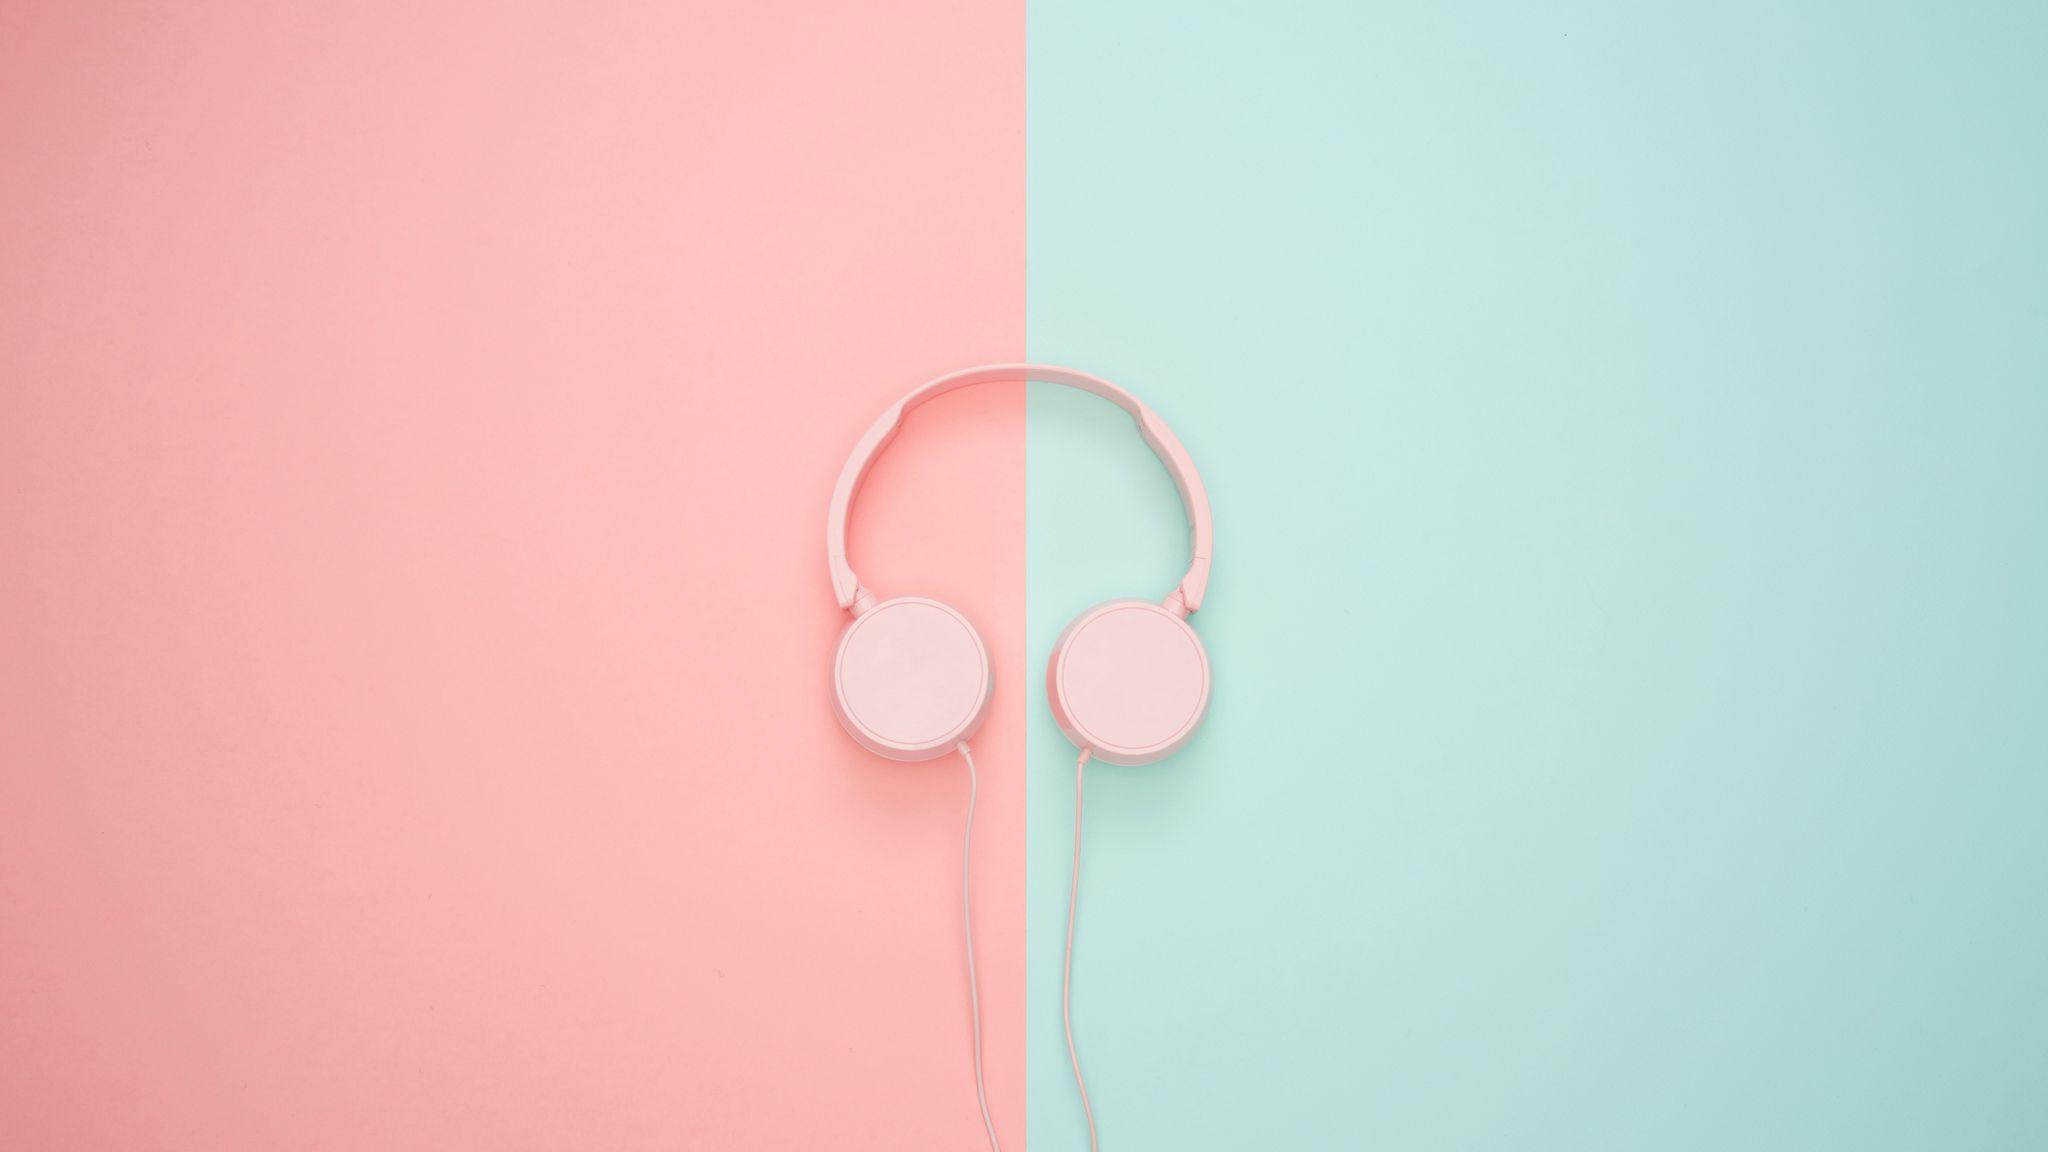 2048x1152 Wallpaper headphones, minimalism, pink, pastel